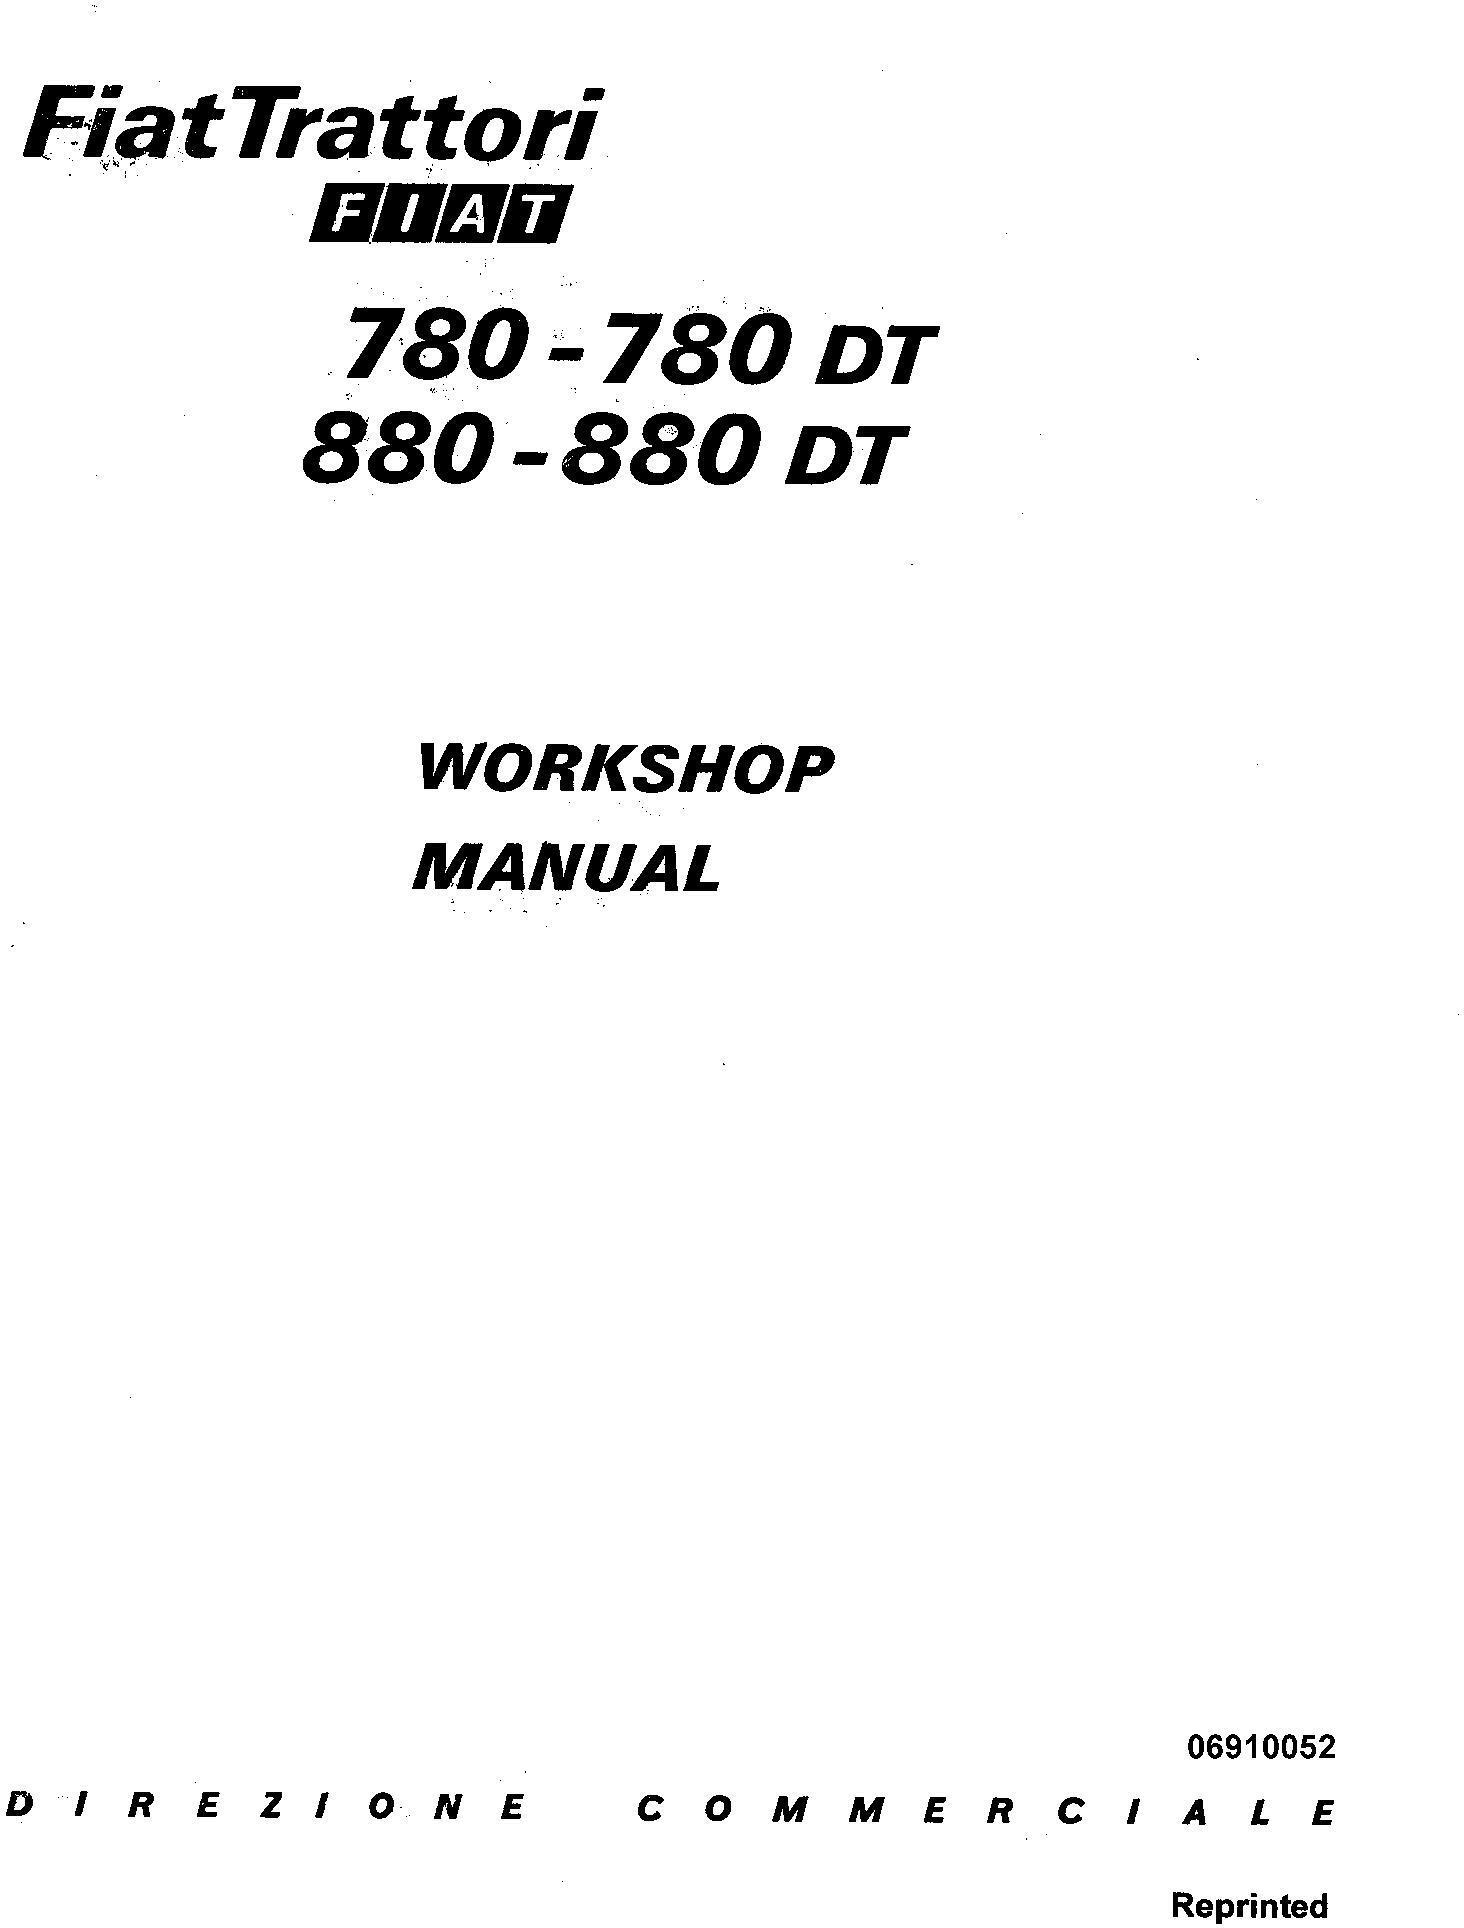 Fiat 780, 780DT, 880, 880DT Tractor Workshop Service